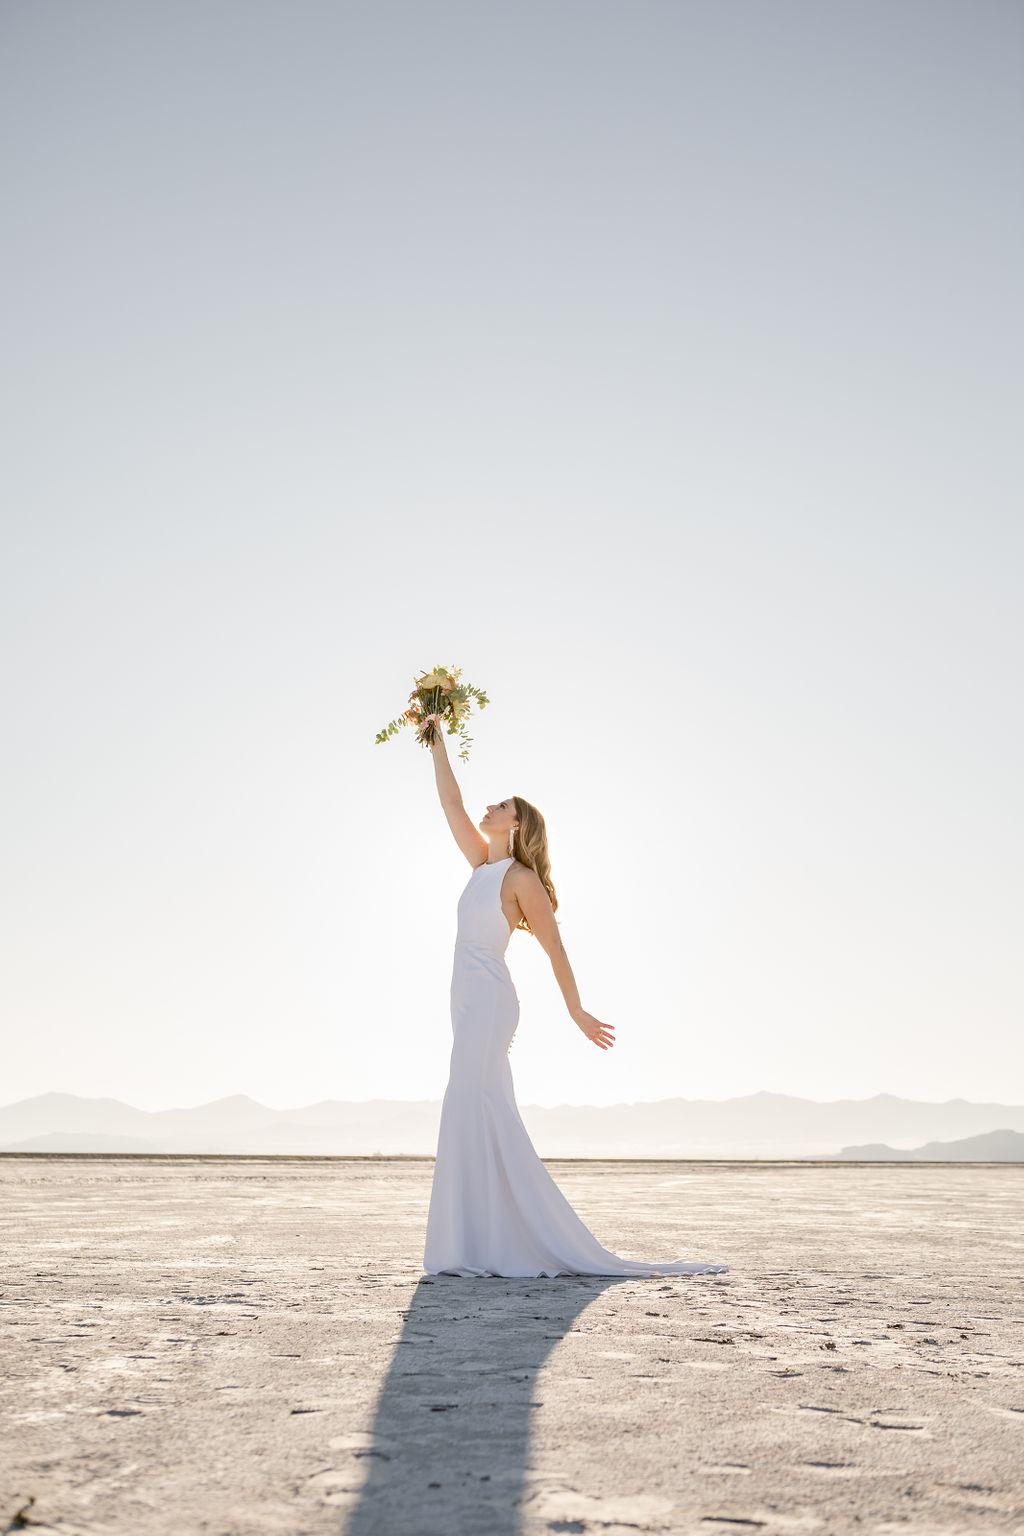 Simple Elegant Modern Goli June Brighton Wedding Dress Victoria Chukarov Salt Flats Utah 8